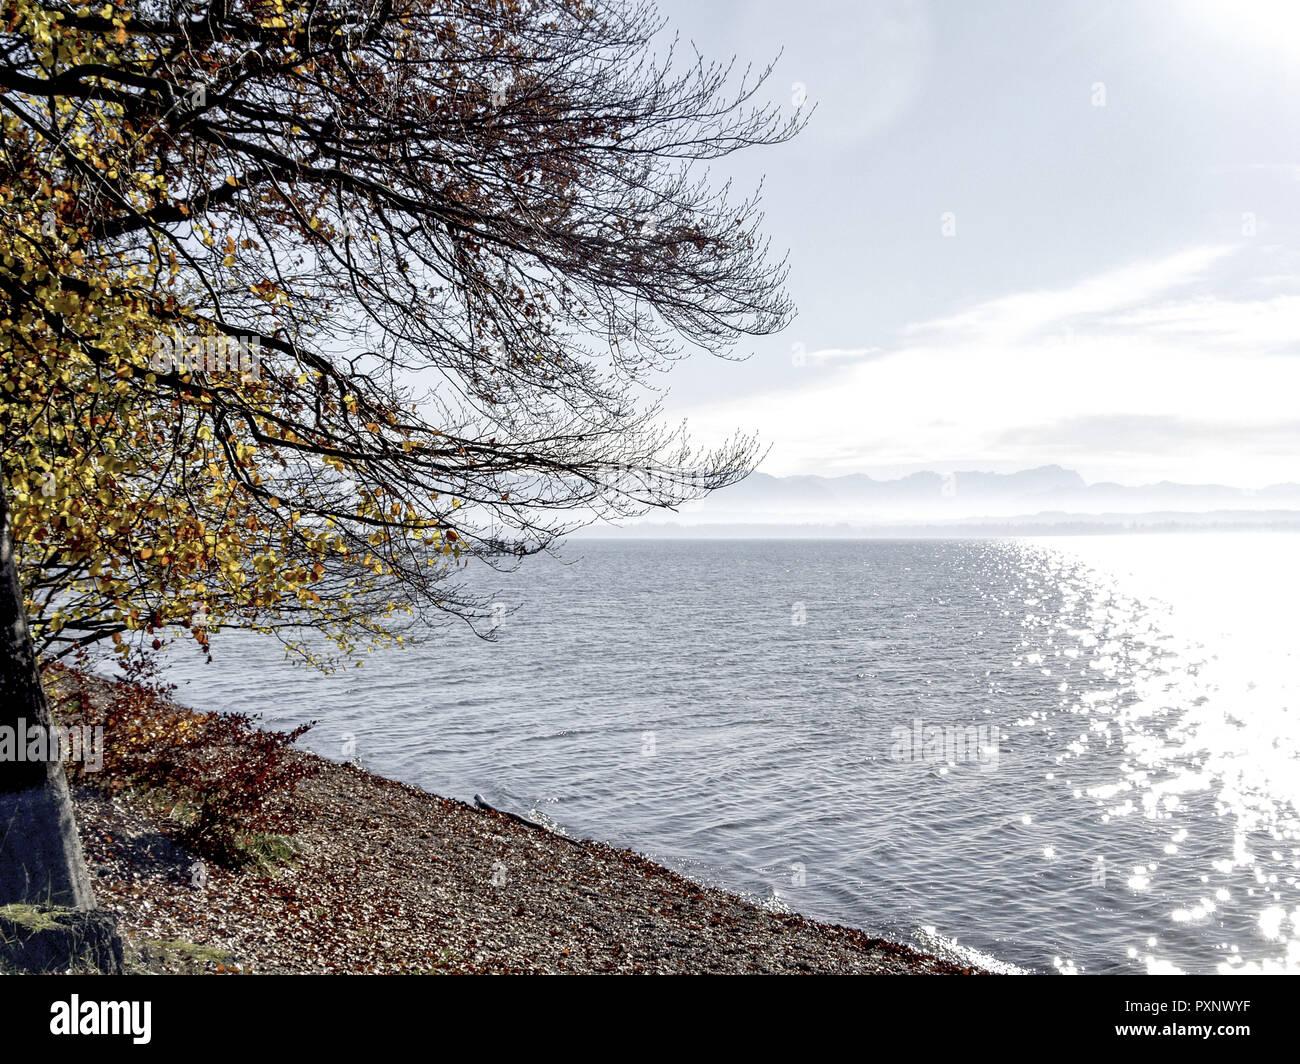 Germany, Bayern, Herbststimmung am Starnberger See - Stock Image